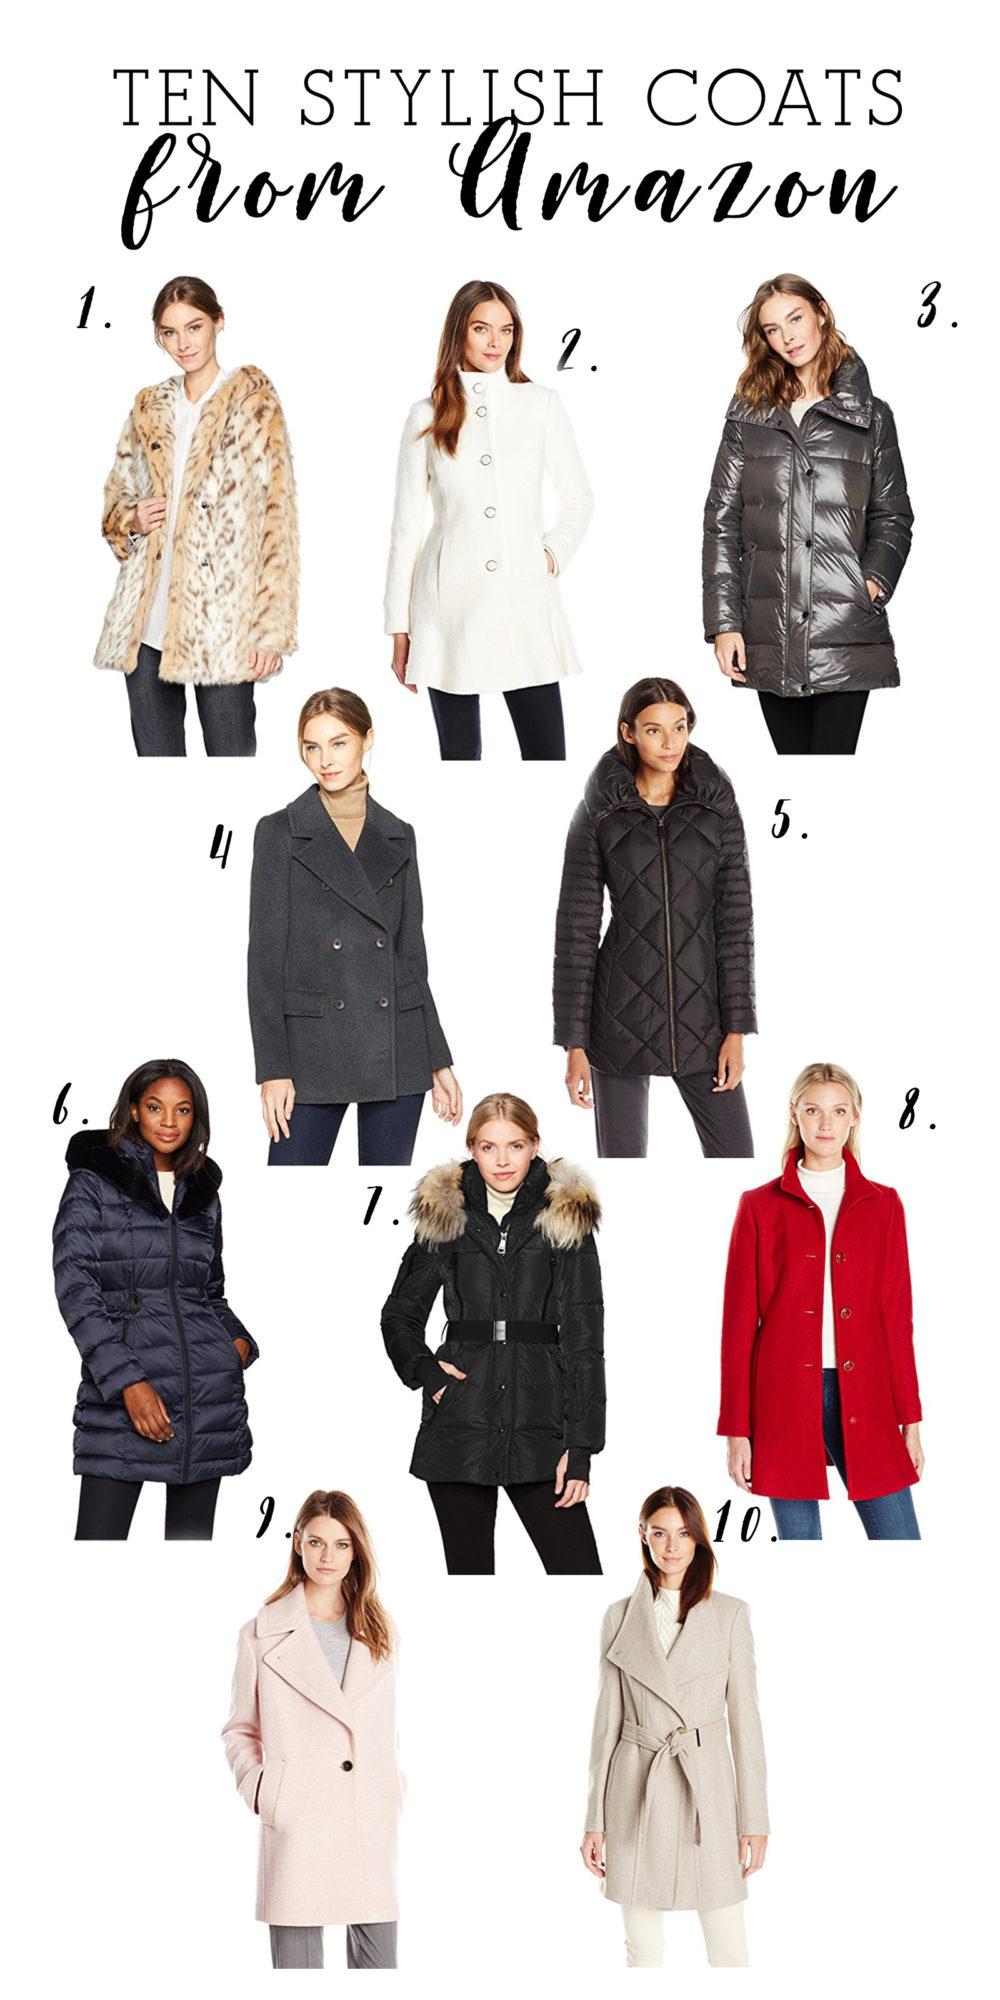 Petite Fashion and Style Blog | Ten Stylish Coats from Amazon | Amazon Winter Coats